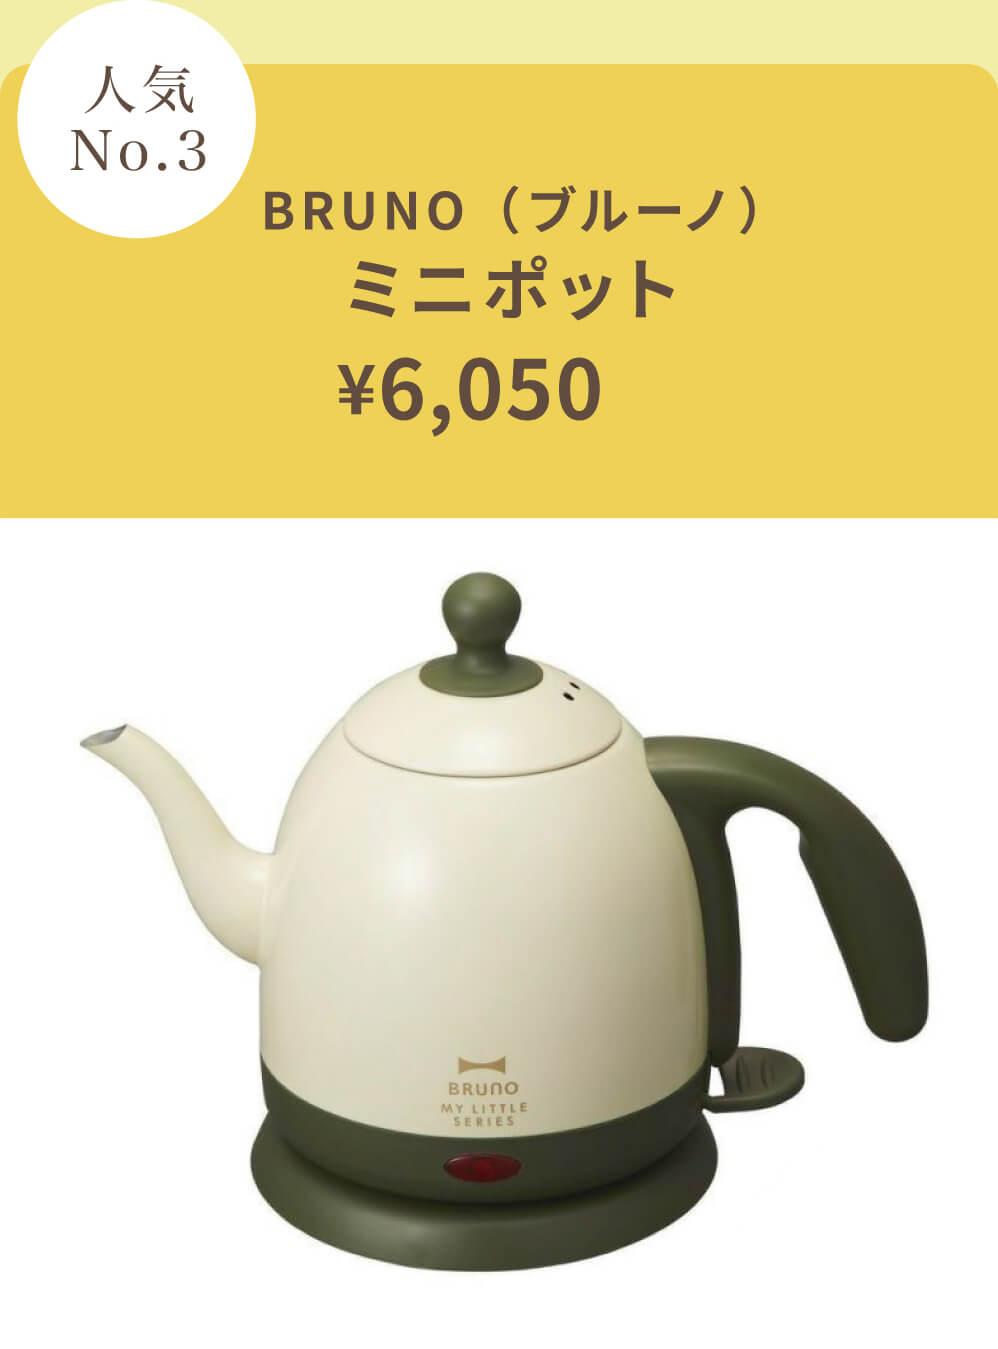 BRUNO(ブルーノ) ミニポット BE 【ボックス入り】